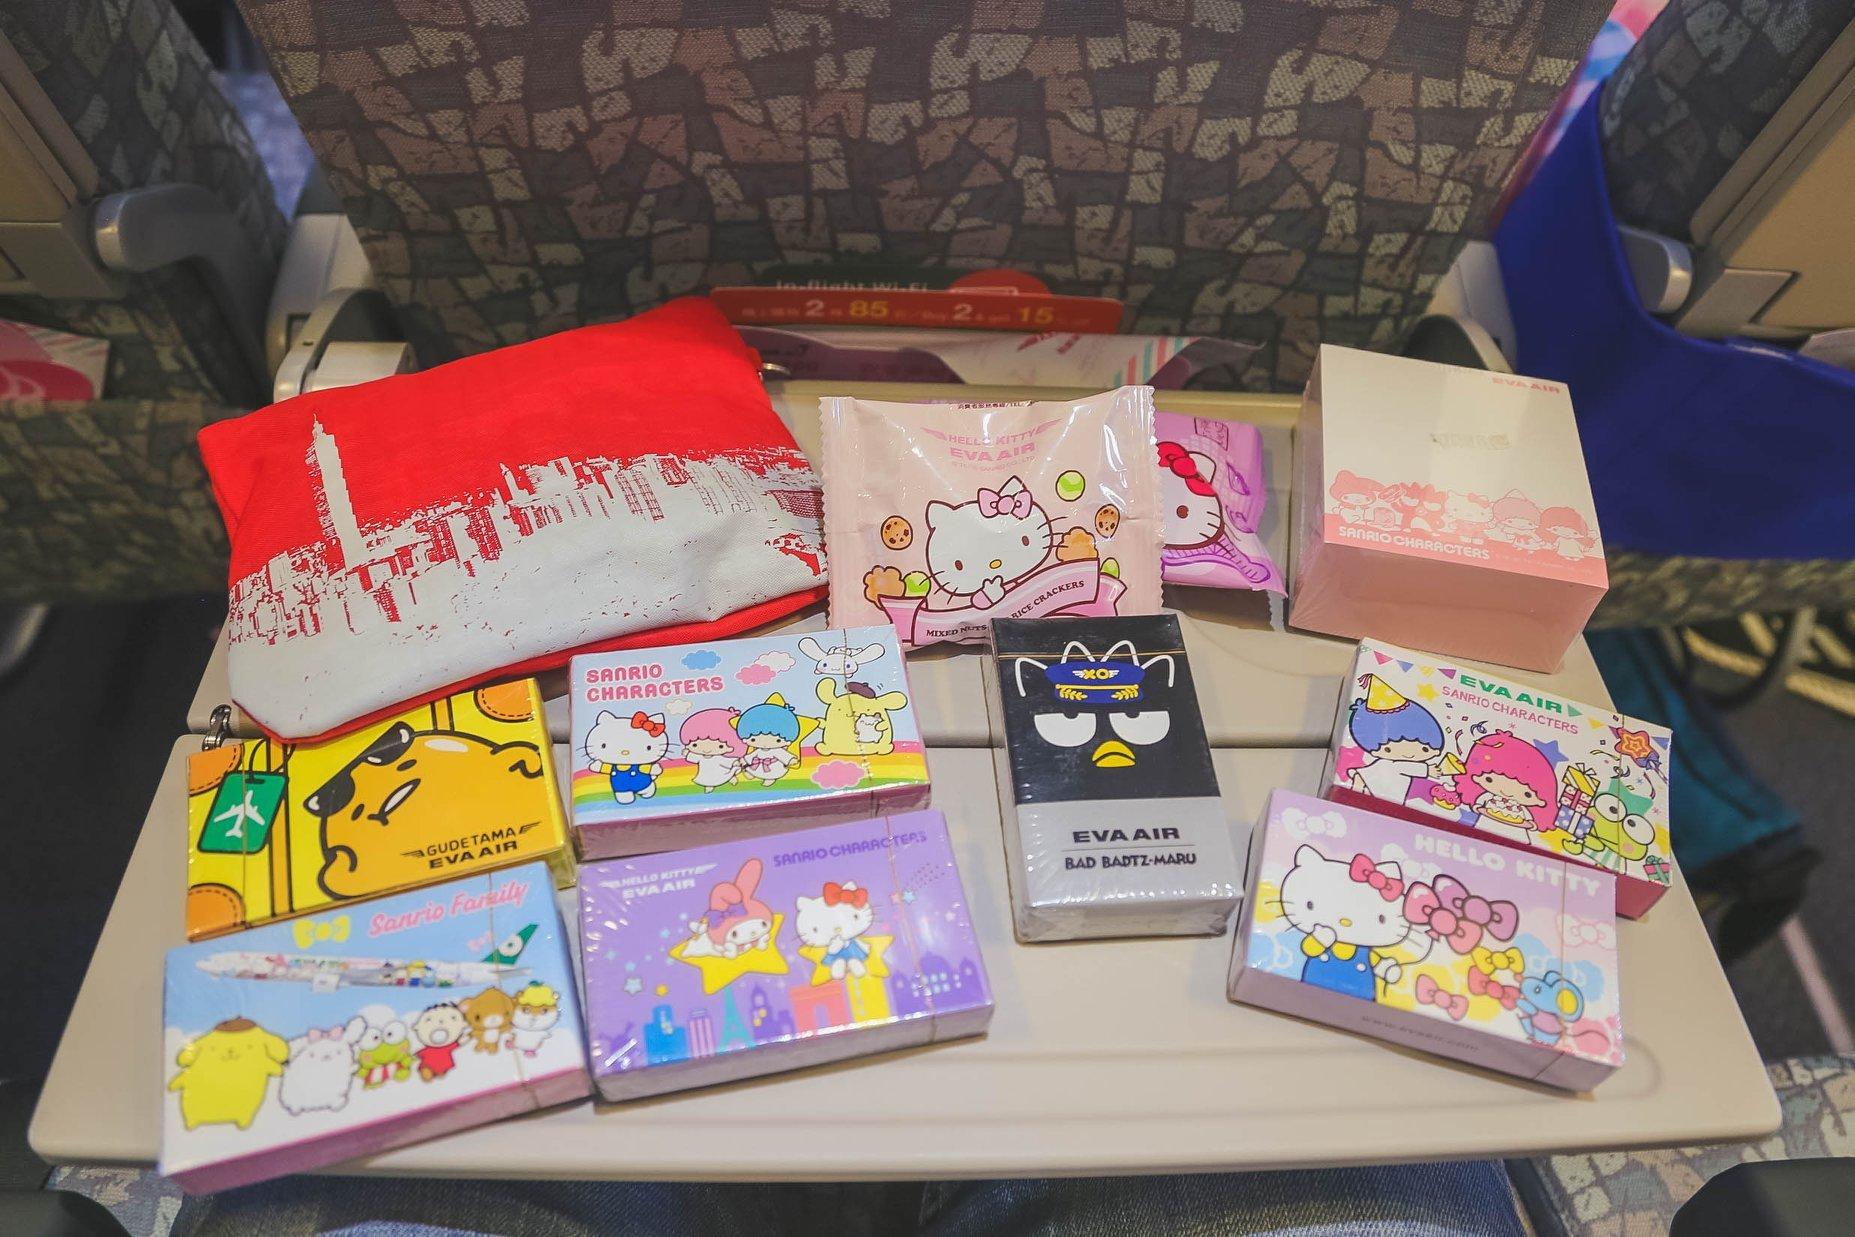 Passageiros de voo temático ganharamb brindes da Hello Kitty da Eva Air